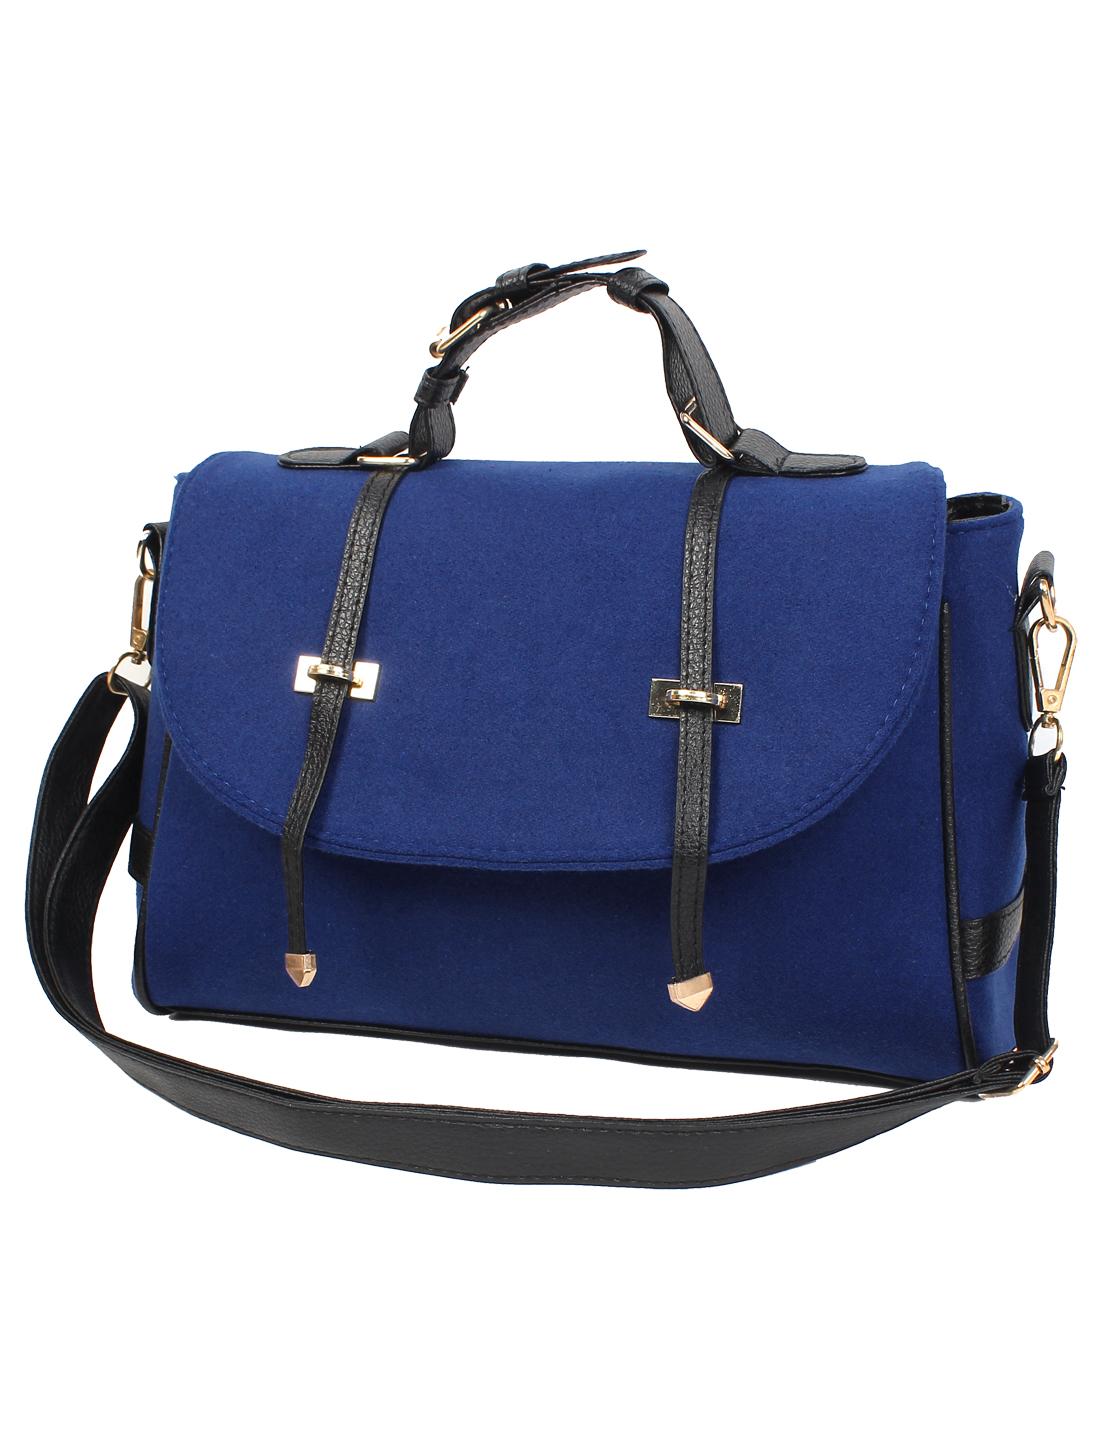 Fashion Nubuck Leather New Women Handbag Tote Shoulder Messenger Hobo Bag Blue